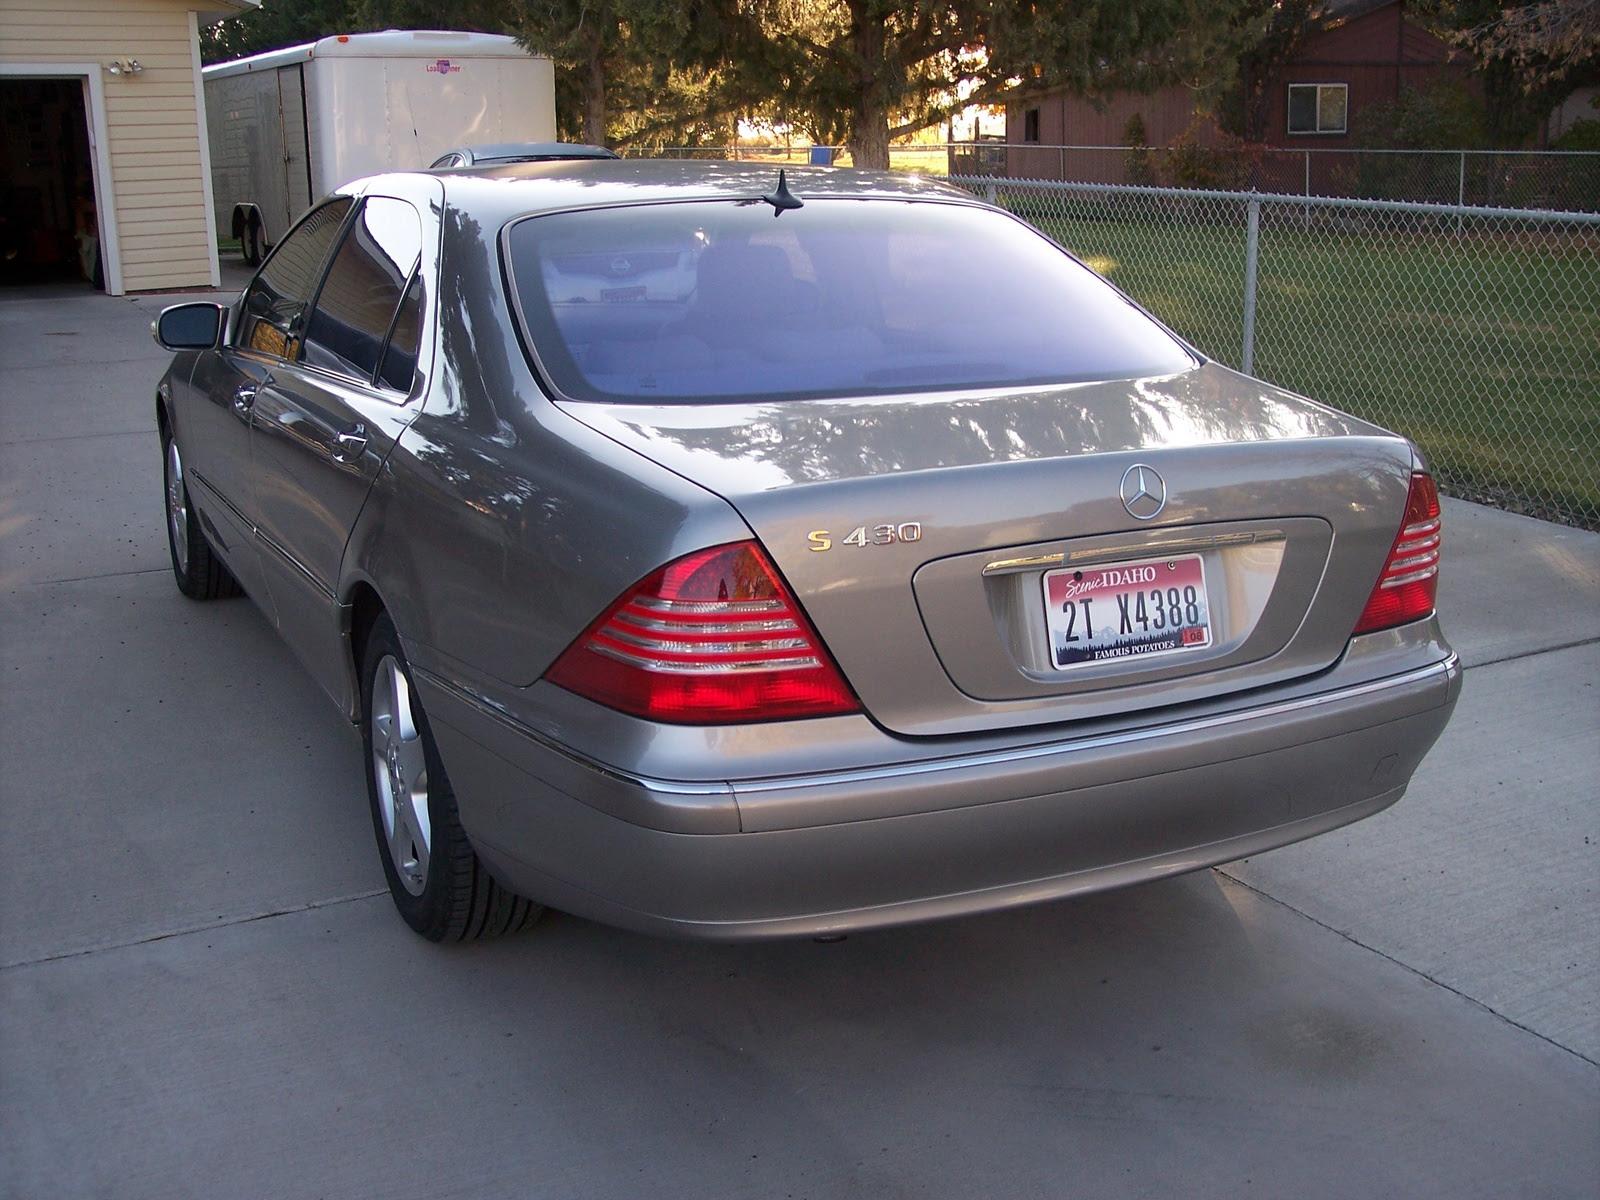 2004 Mercedes-Benz S-Class - Pictures - CarGurus